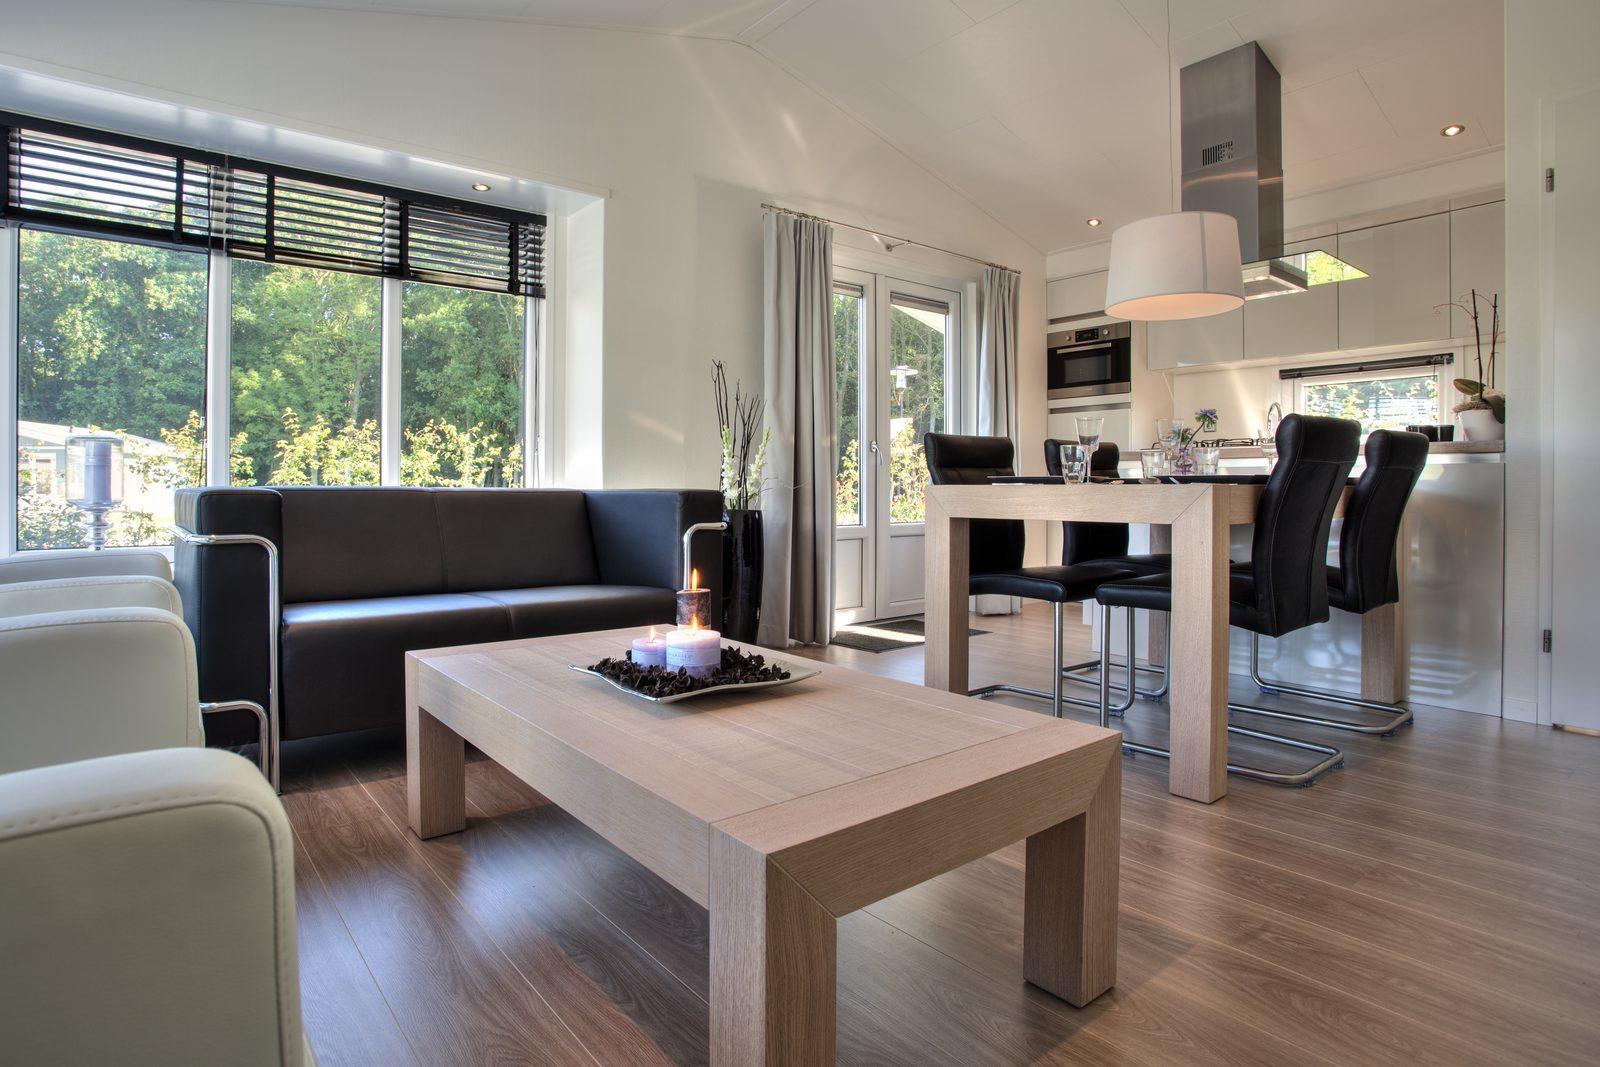 Duna Casa | Private Nutzung